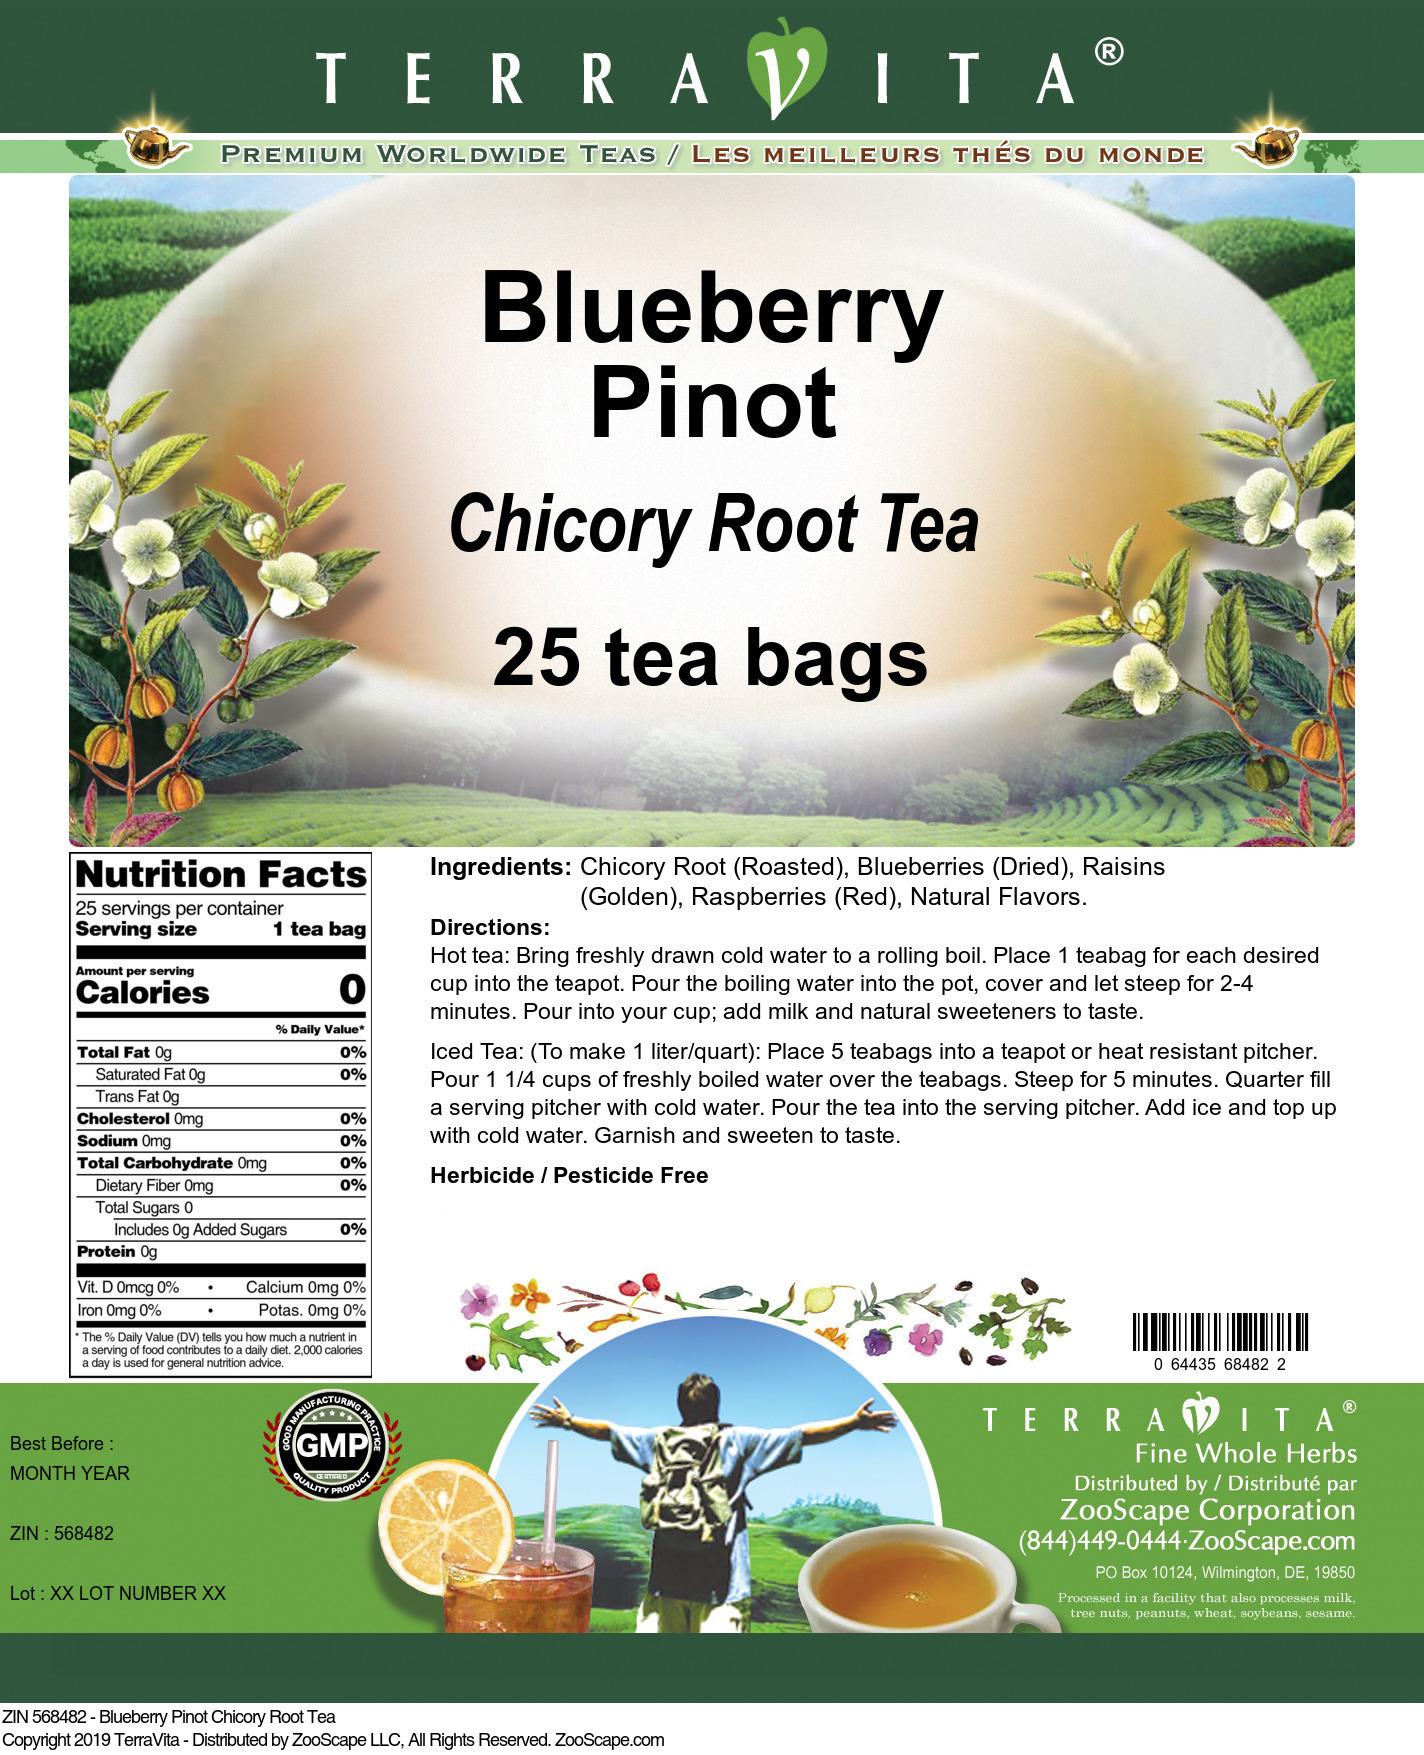 Blueberry Pinot Chicory Root Tea